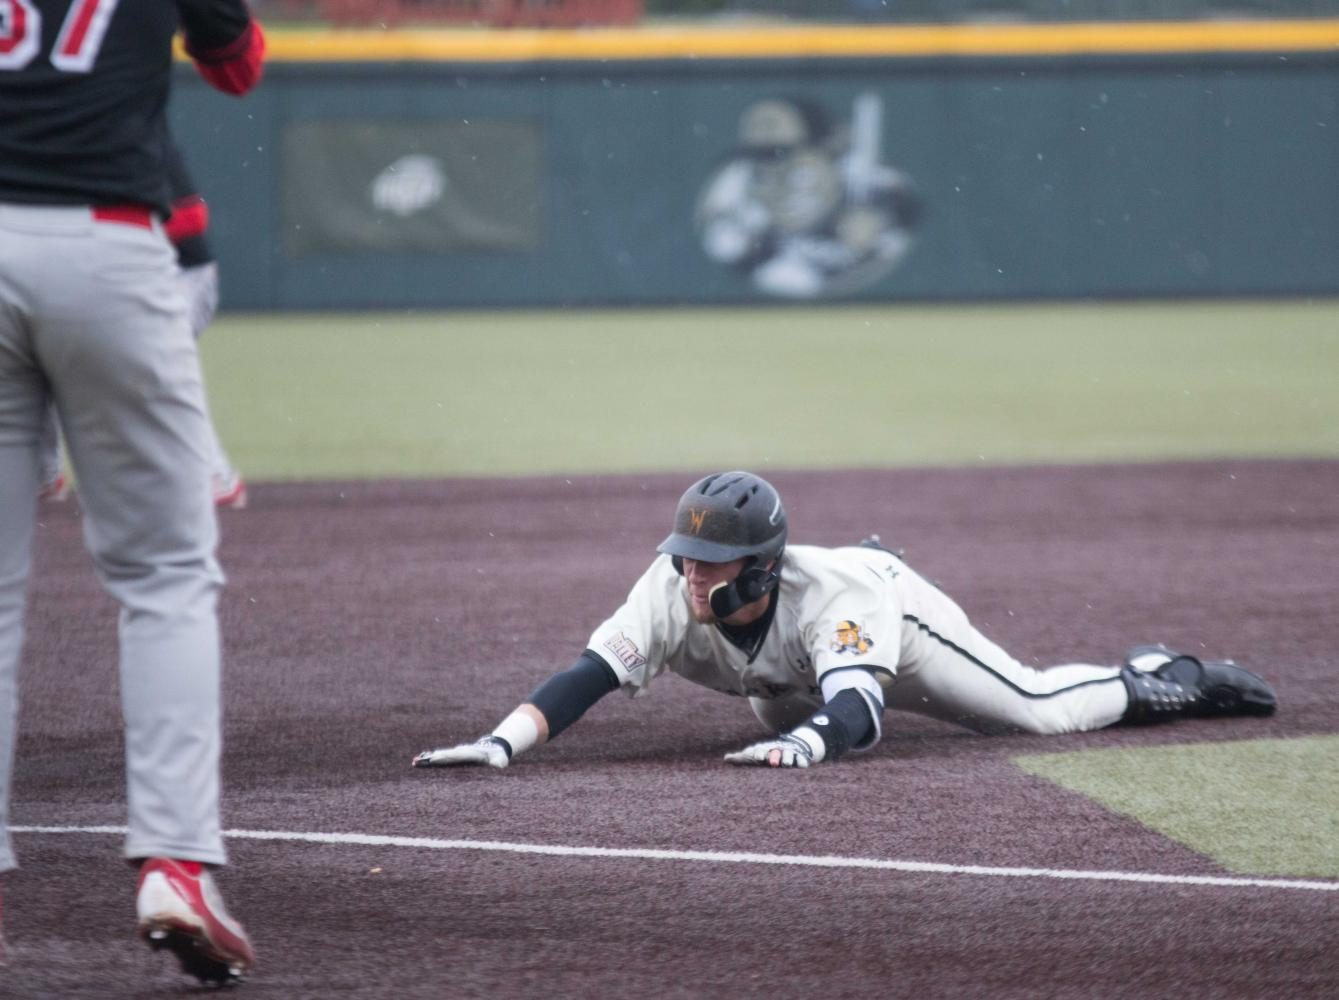 Wichita State infielder Jordan Boyer slides to third base during the game against Illinois State at Eck Stadium (April 29, 2017)